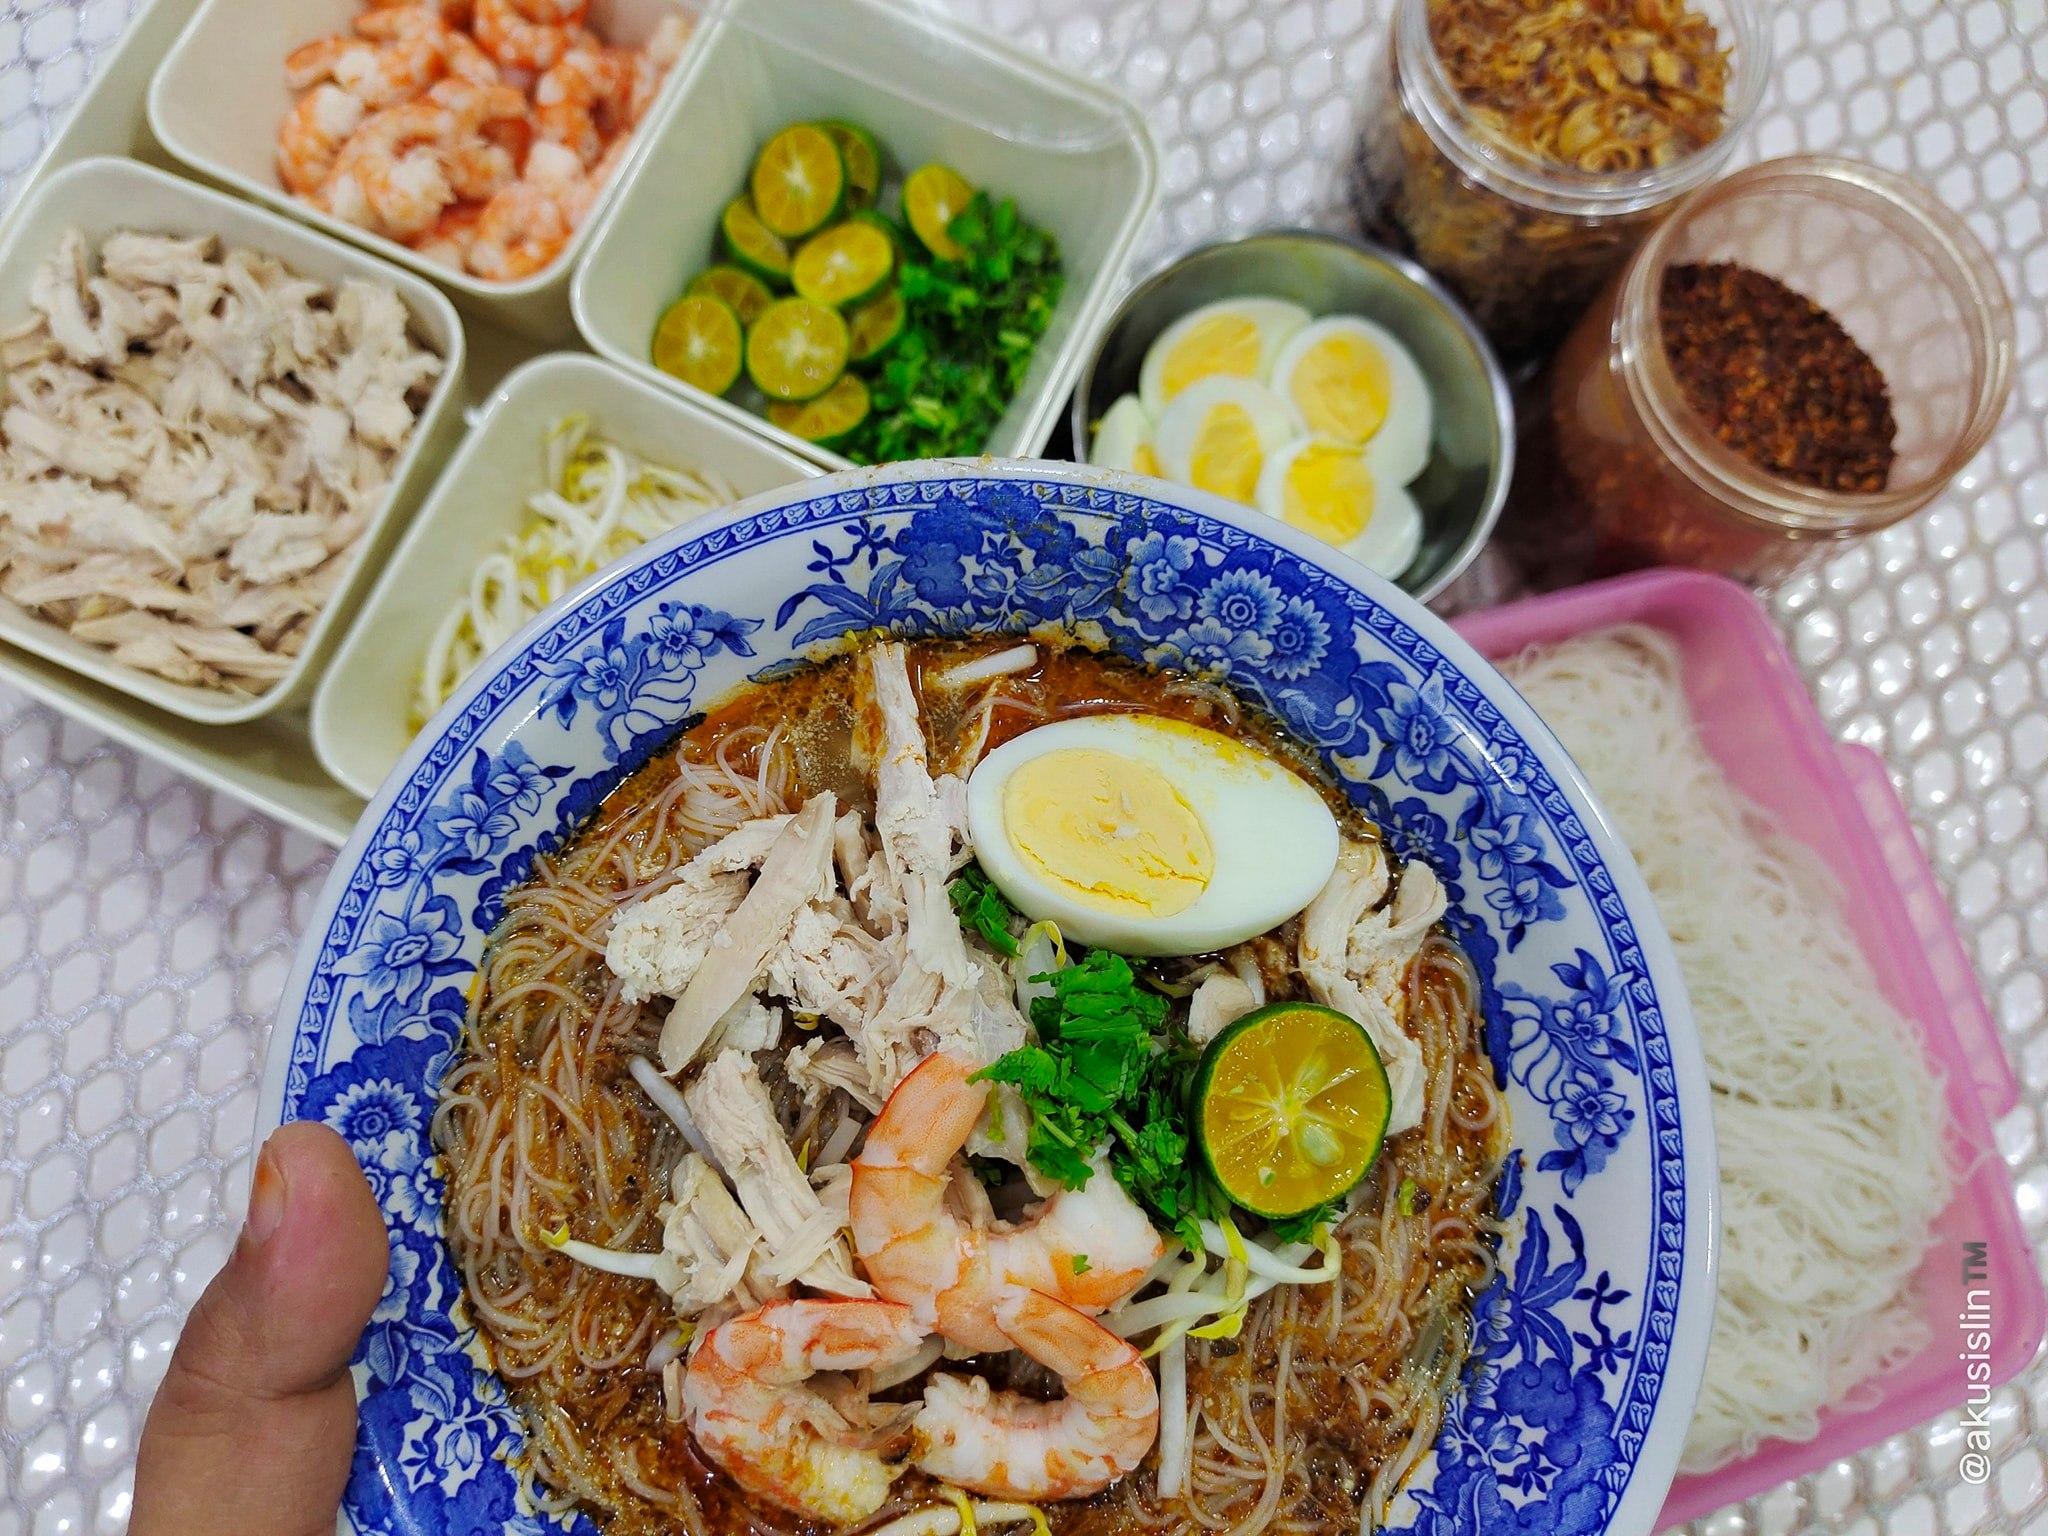 Resepi Laksa Sarawak Mudah Dan Sedap Guna Pes Haji Manan